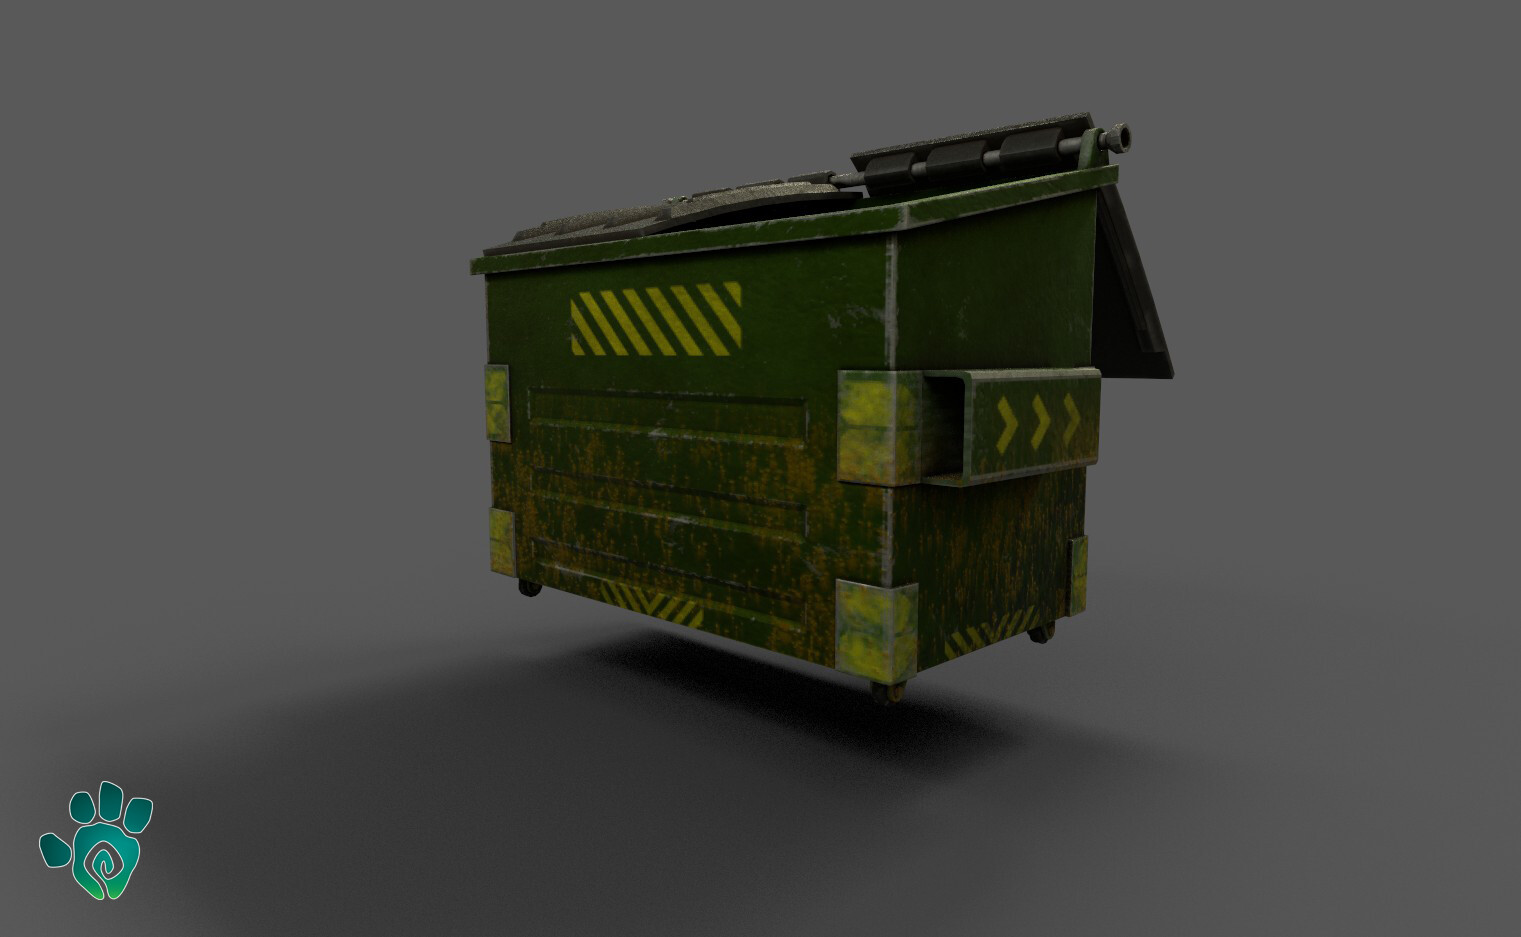 Zach cordisco dumpster 1